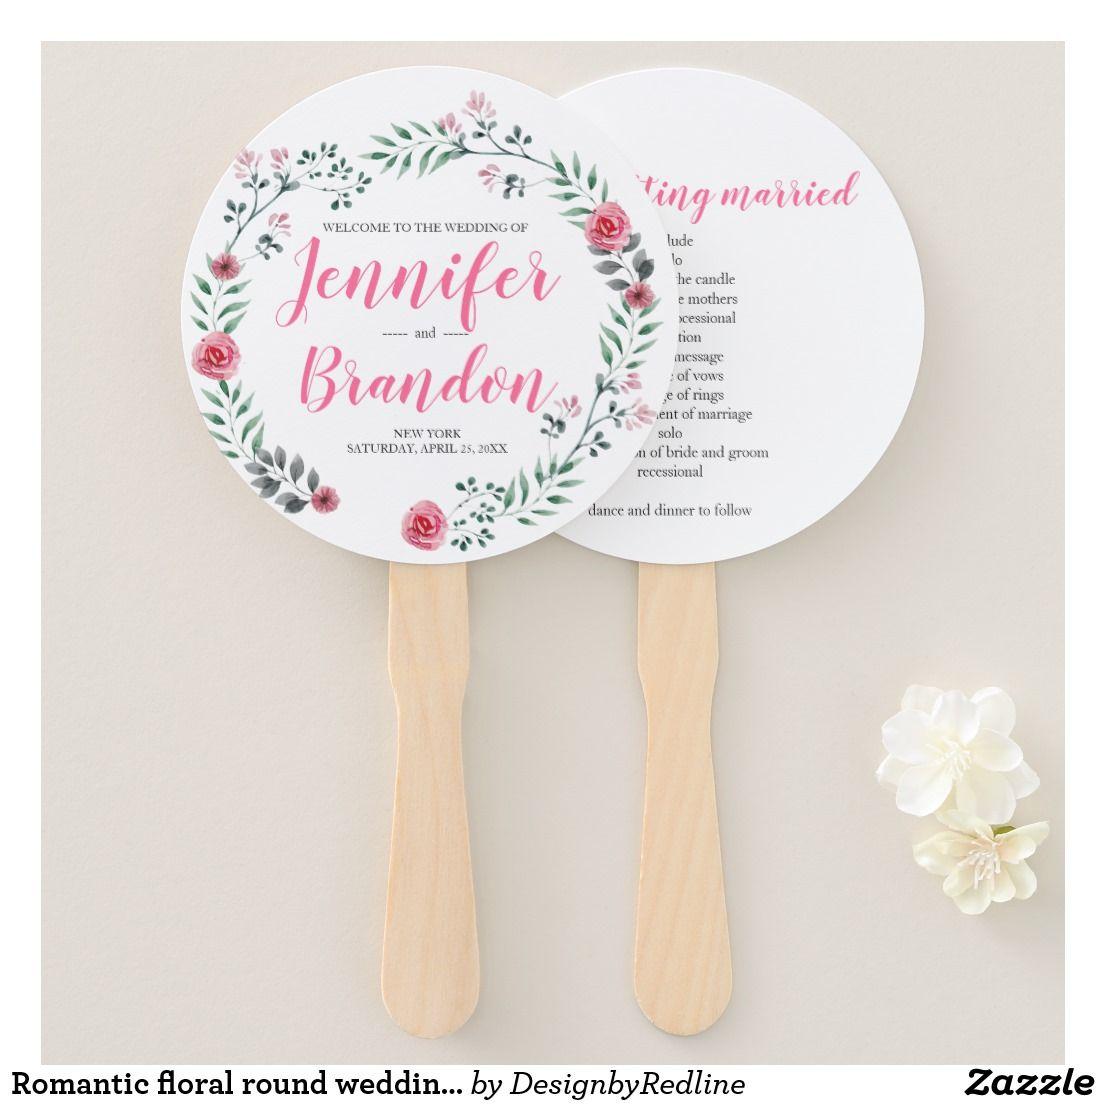 Romantic floral round wedding program fan wedding handpaddle